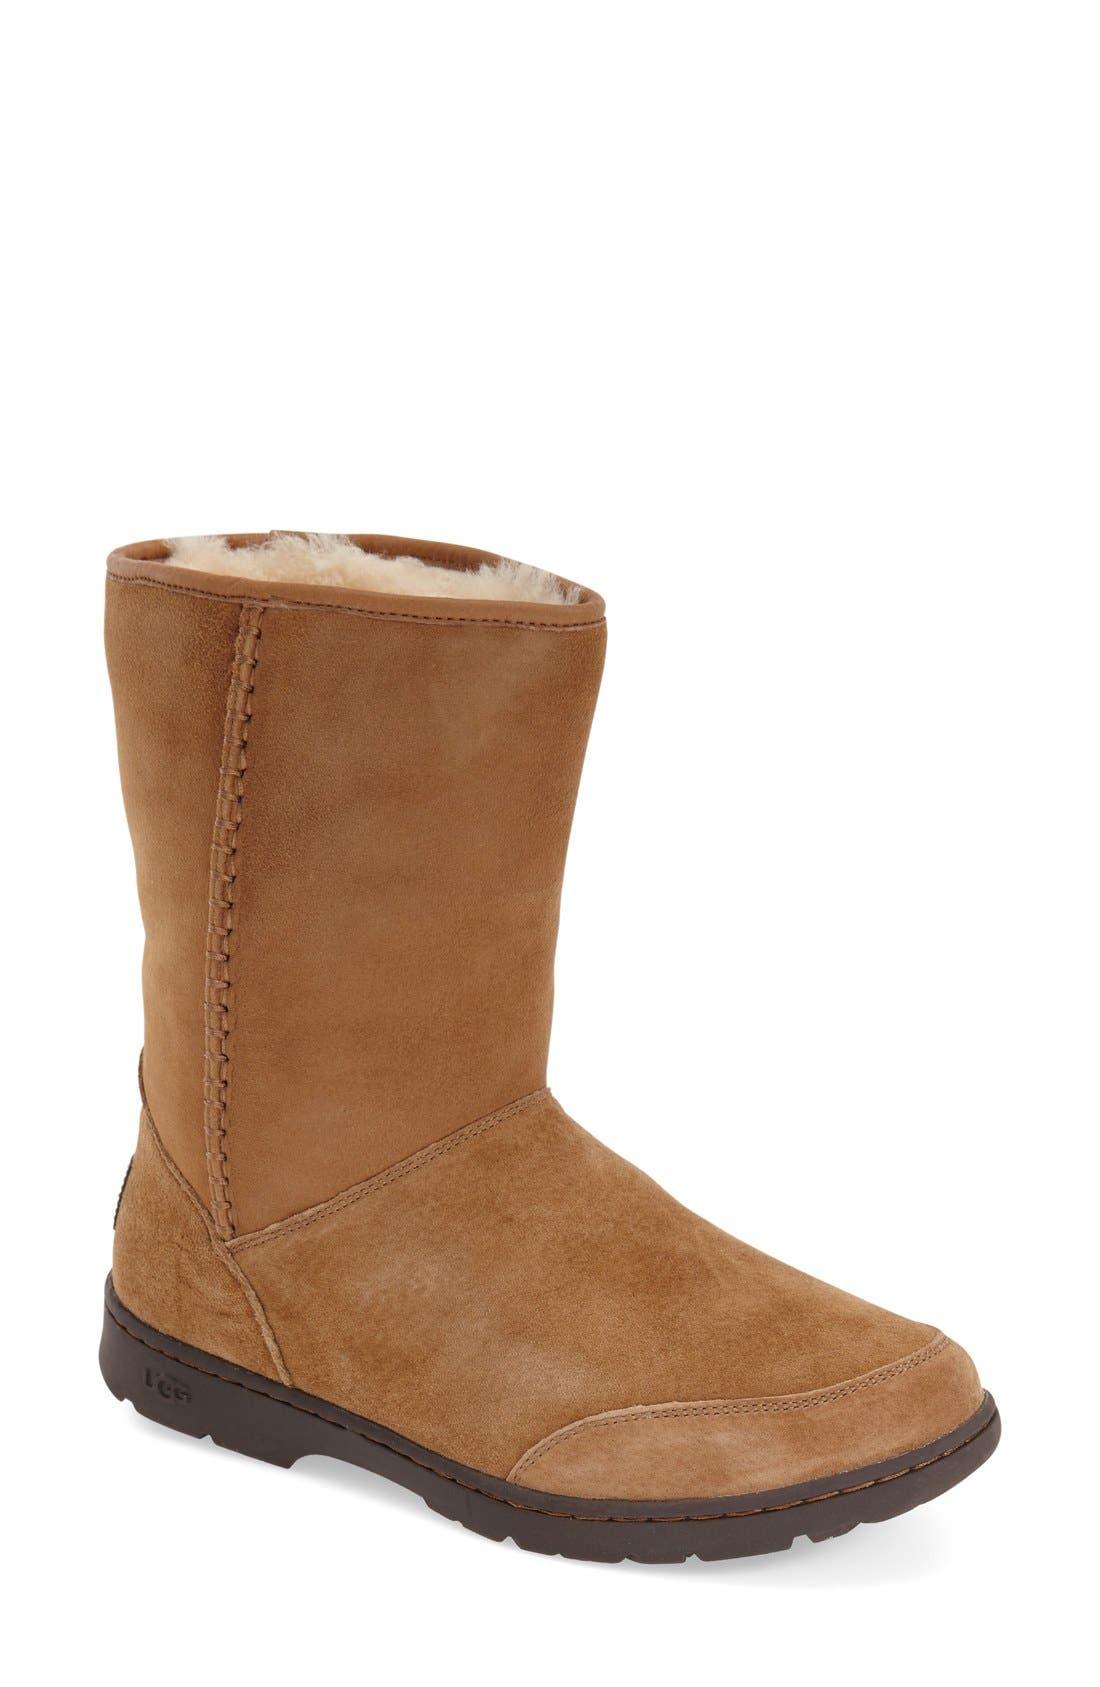 Alternate Image 1 Selected - UGG®Michaela Waterproof Suede Boot (Women)